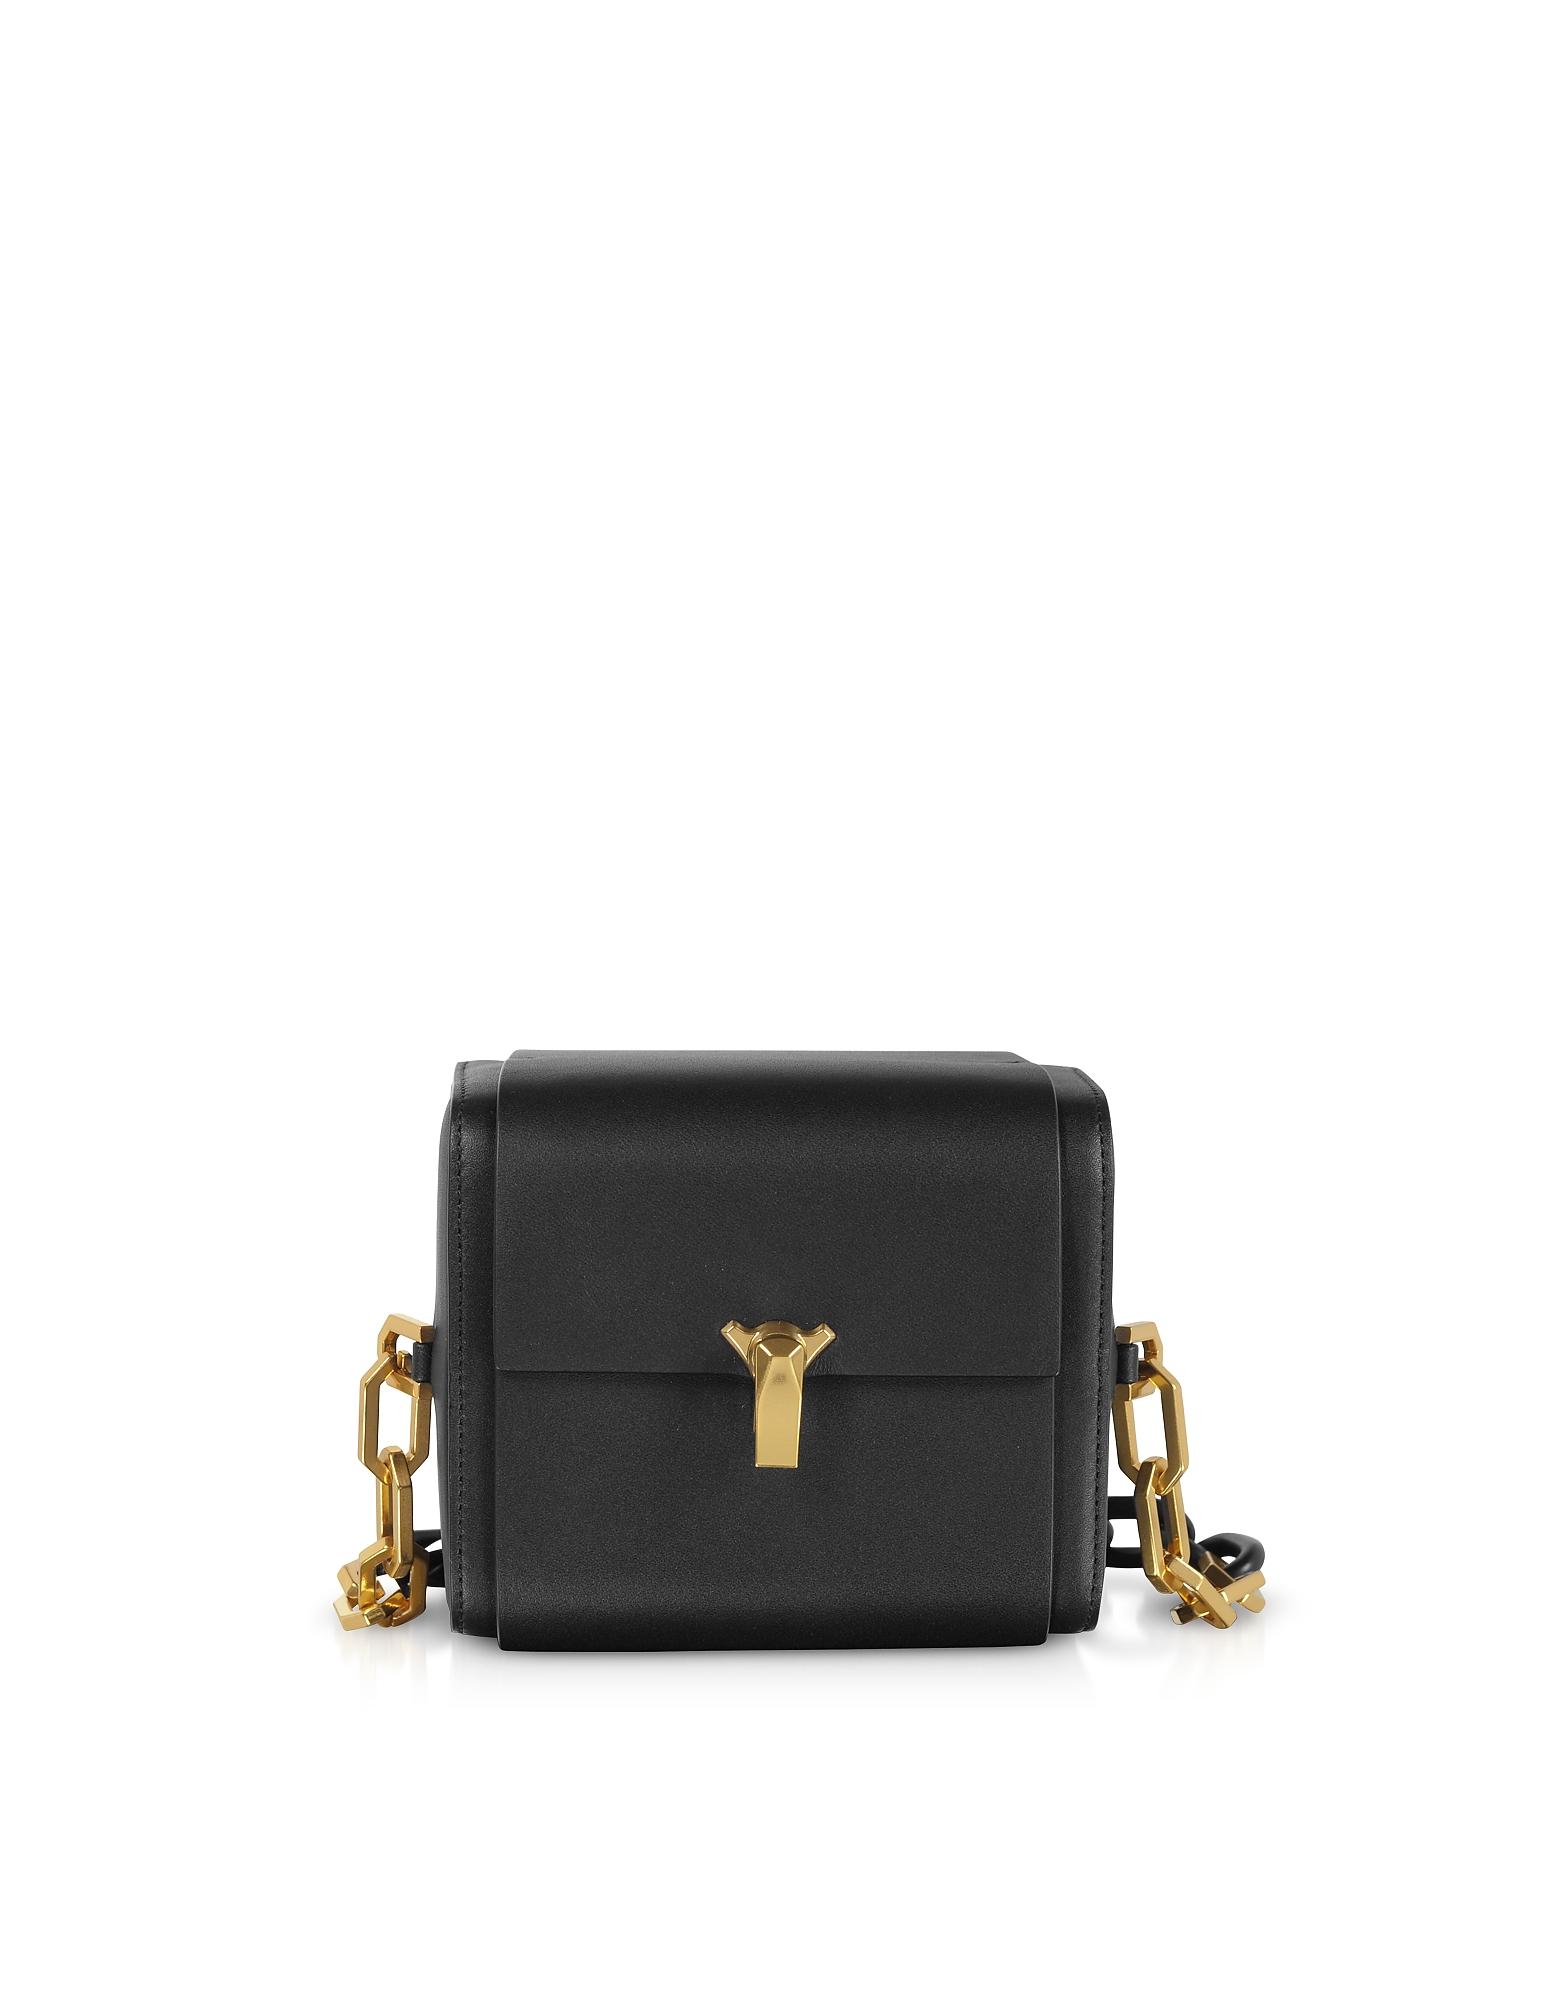 The Volon Designer Handbags, Po Cube Bag